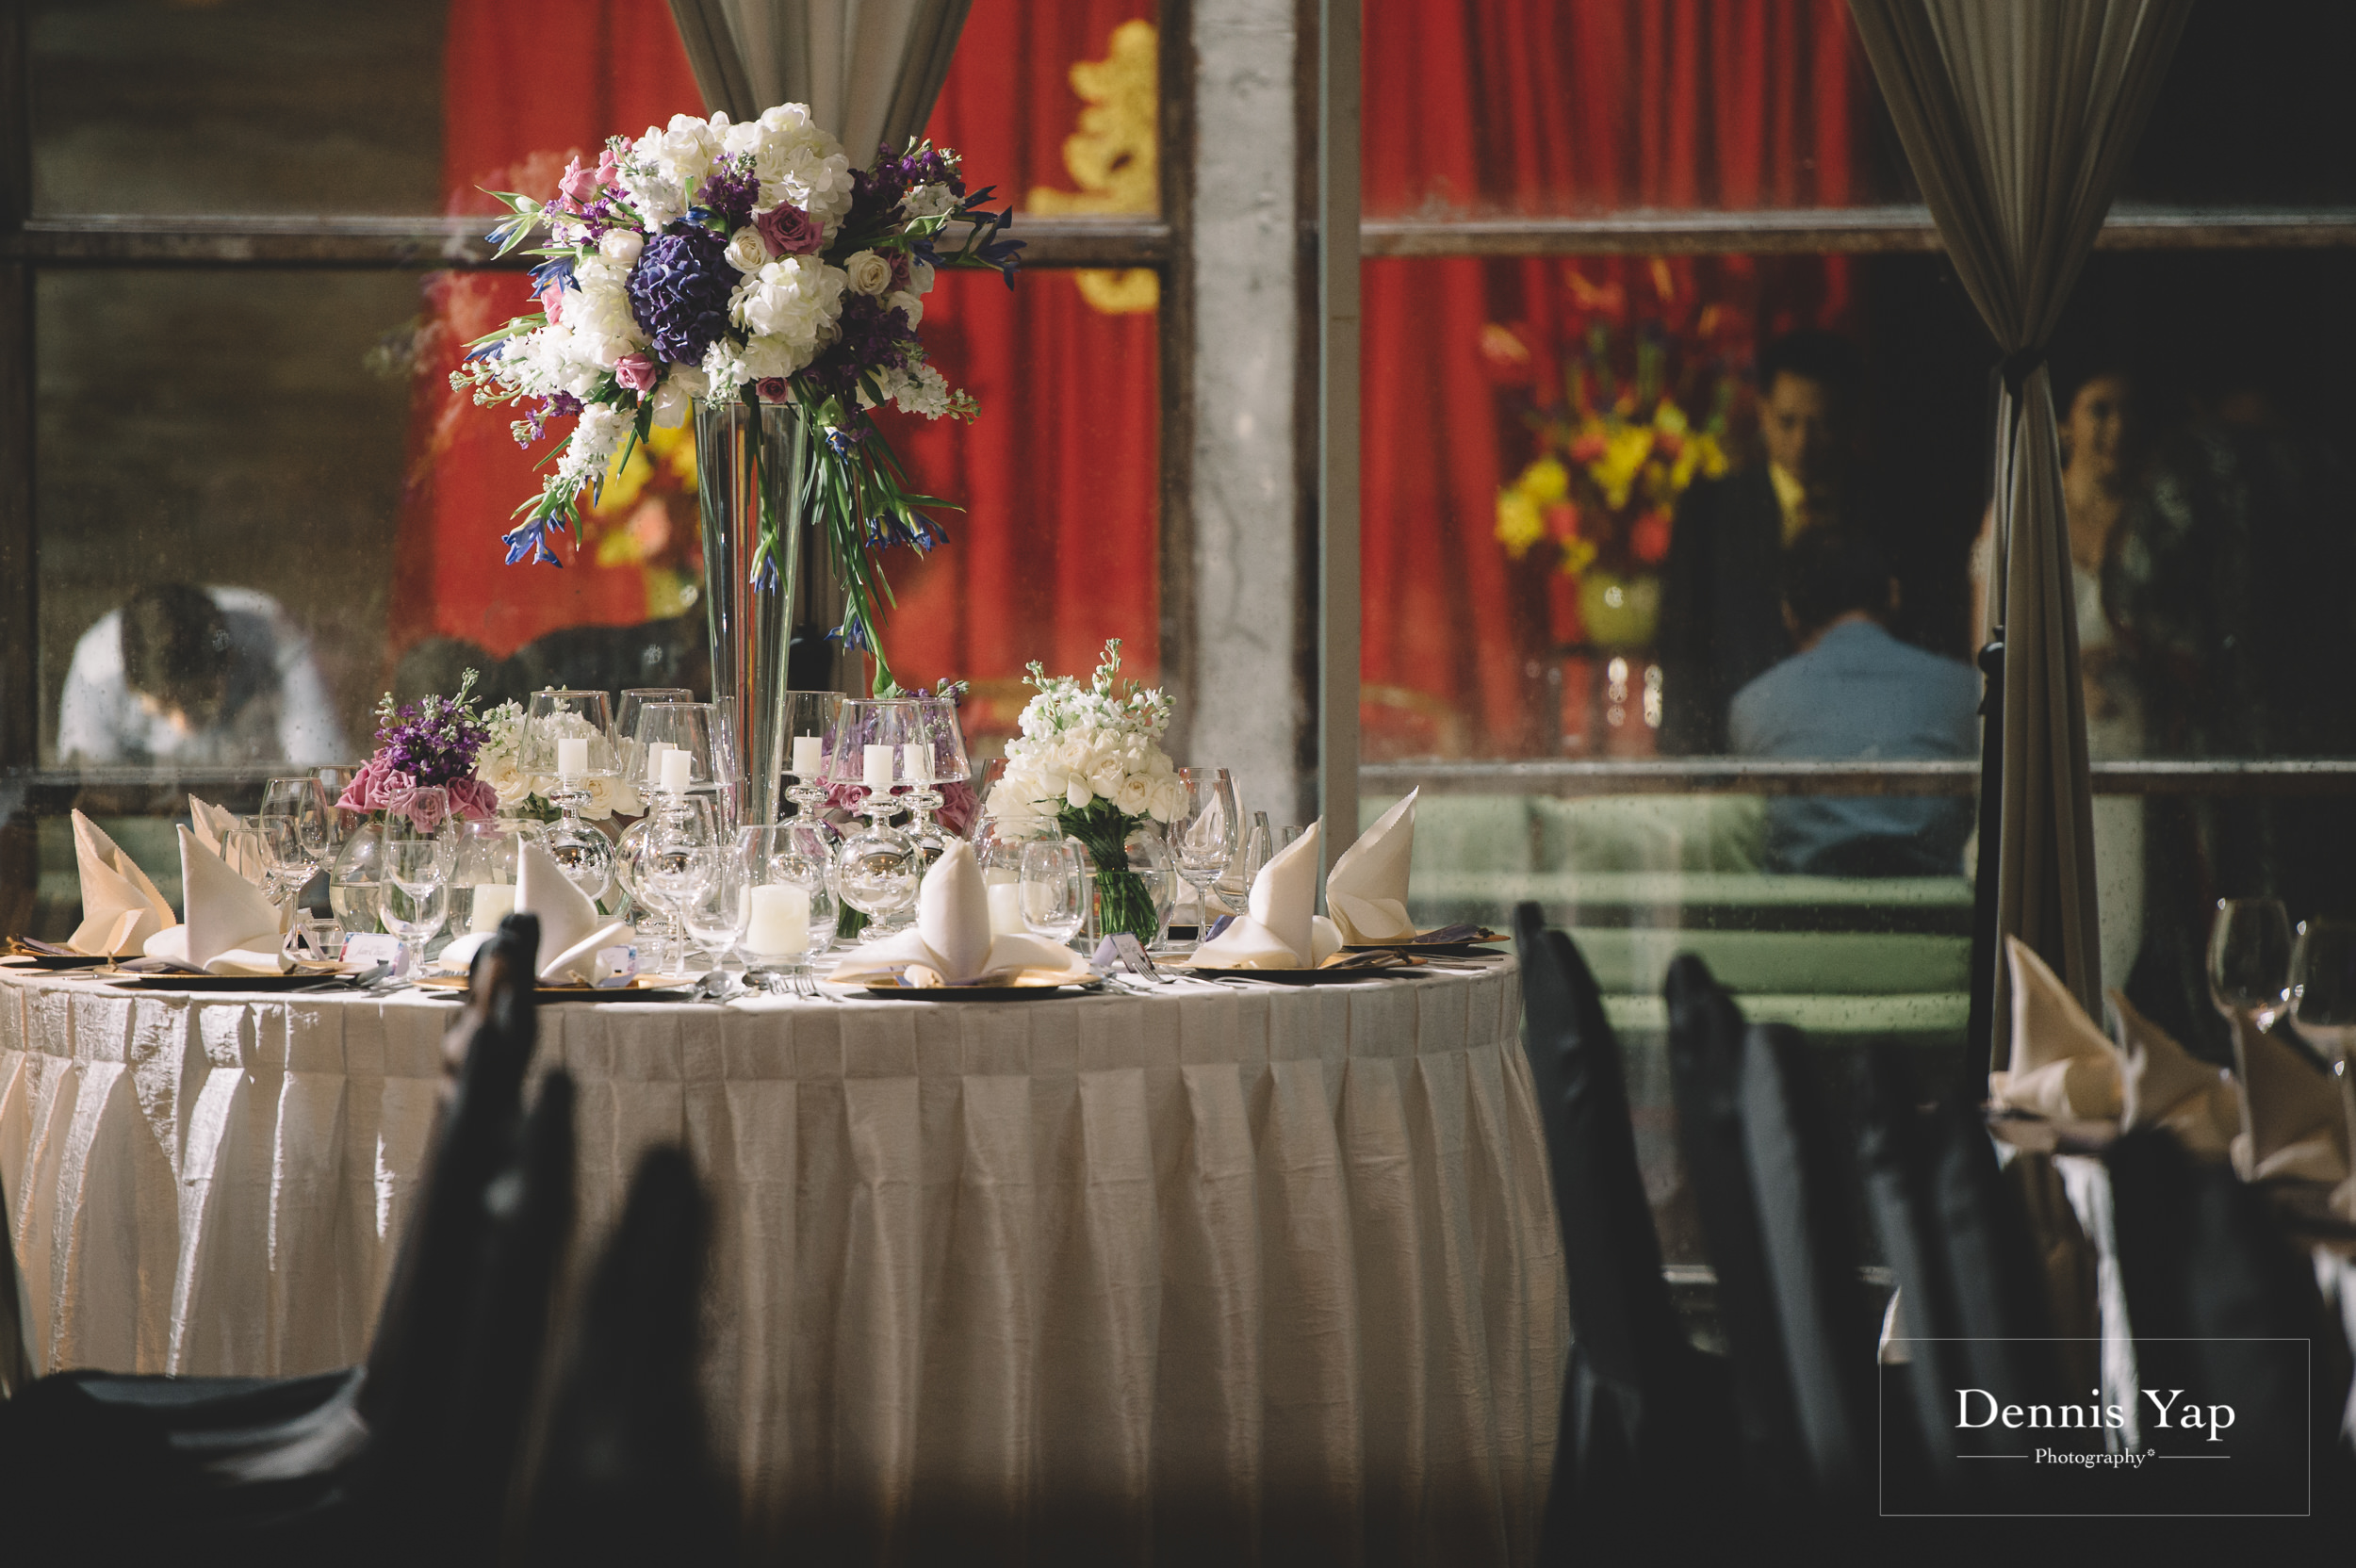 vincent peggy wedding dinner neo tamarind kuala lumpur dennis yap photography-16.jpg